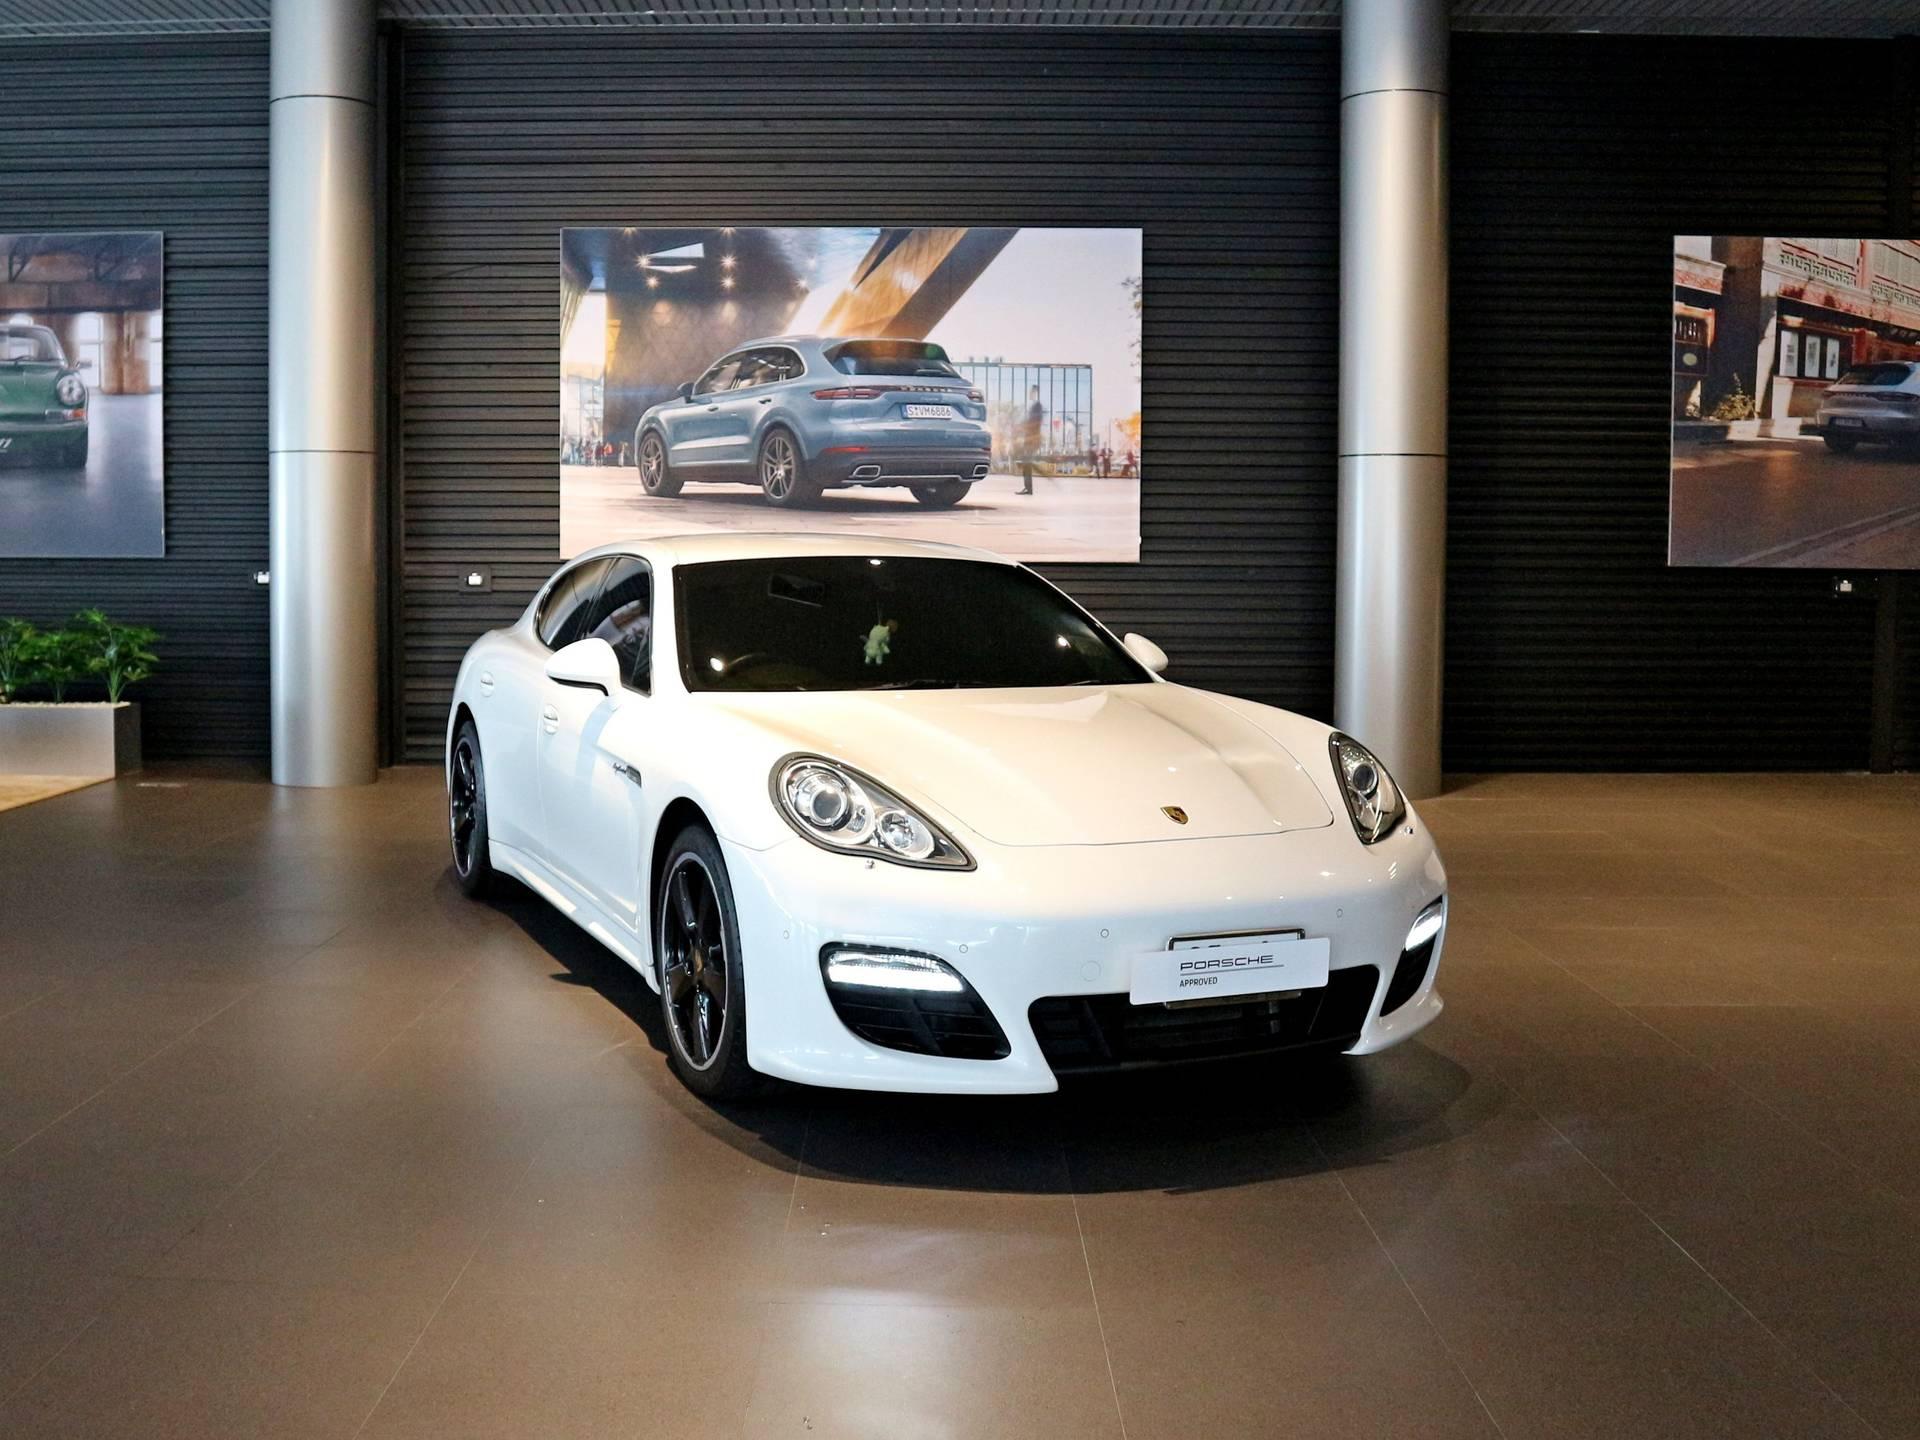 2012 Porsche Panamera S Hybrid – 1